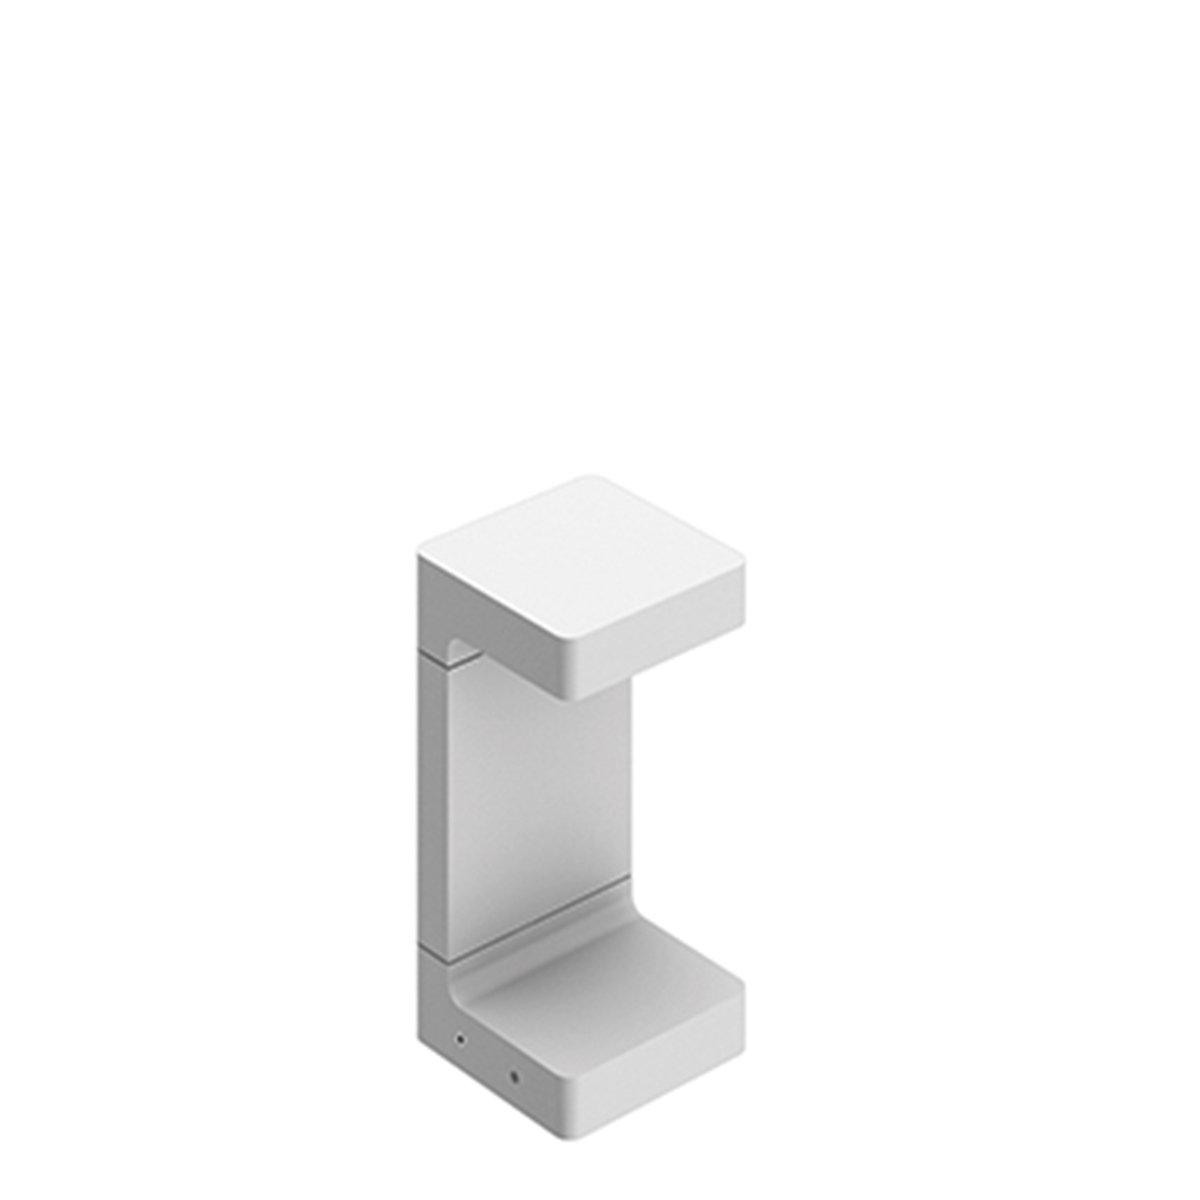 FLOS Casting C100 Outdoor Vloerlamp Wit - 20 cm.